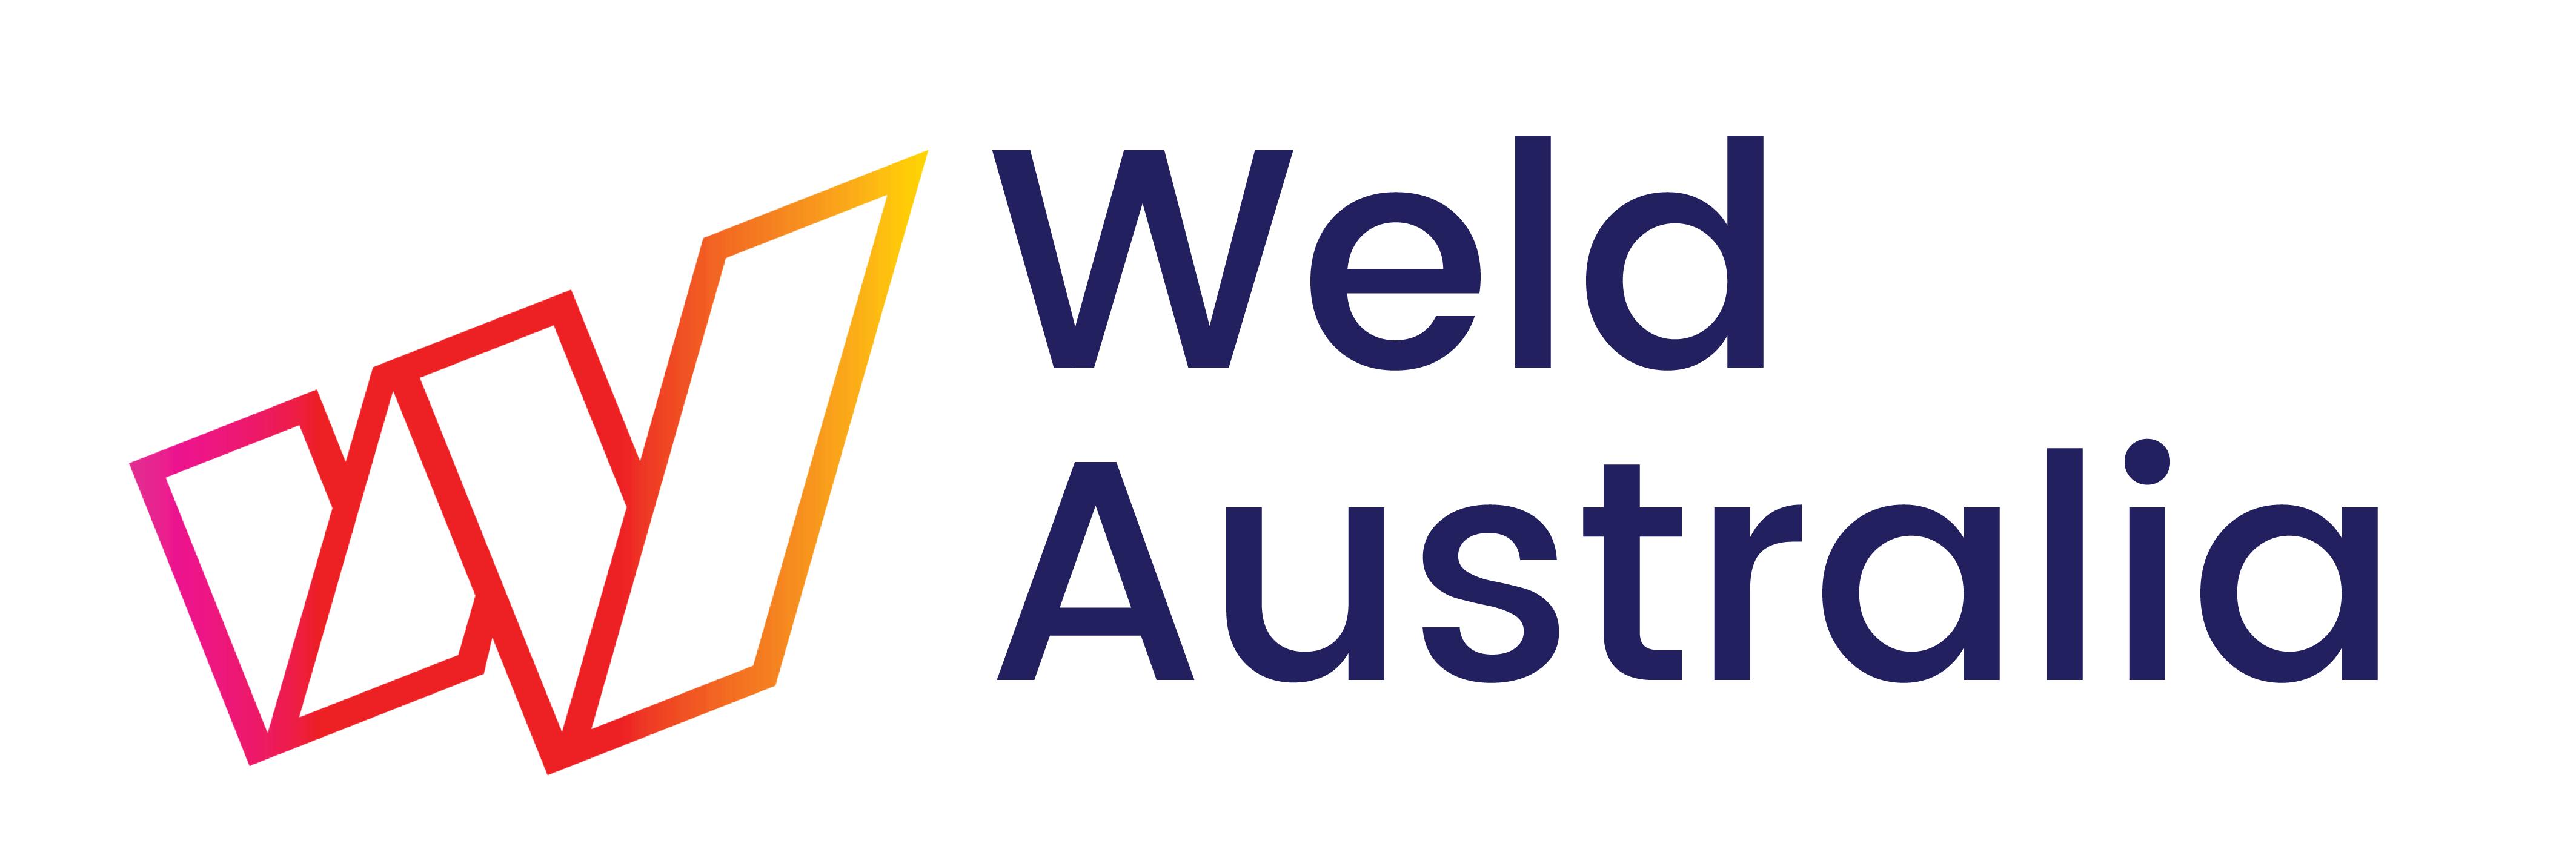 Weld Australia